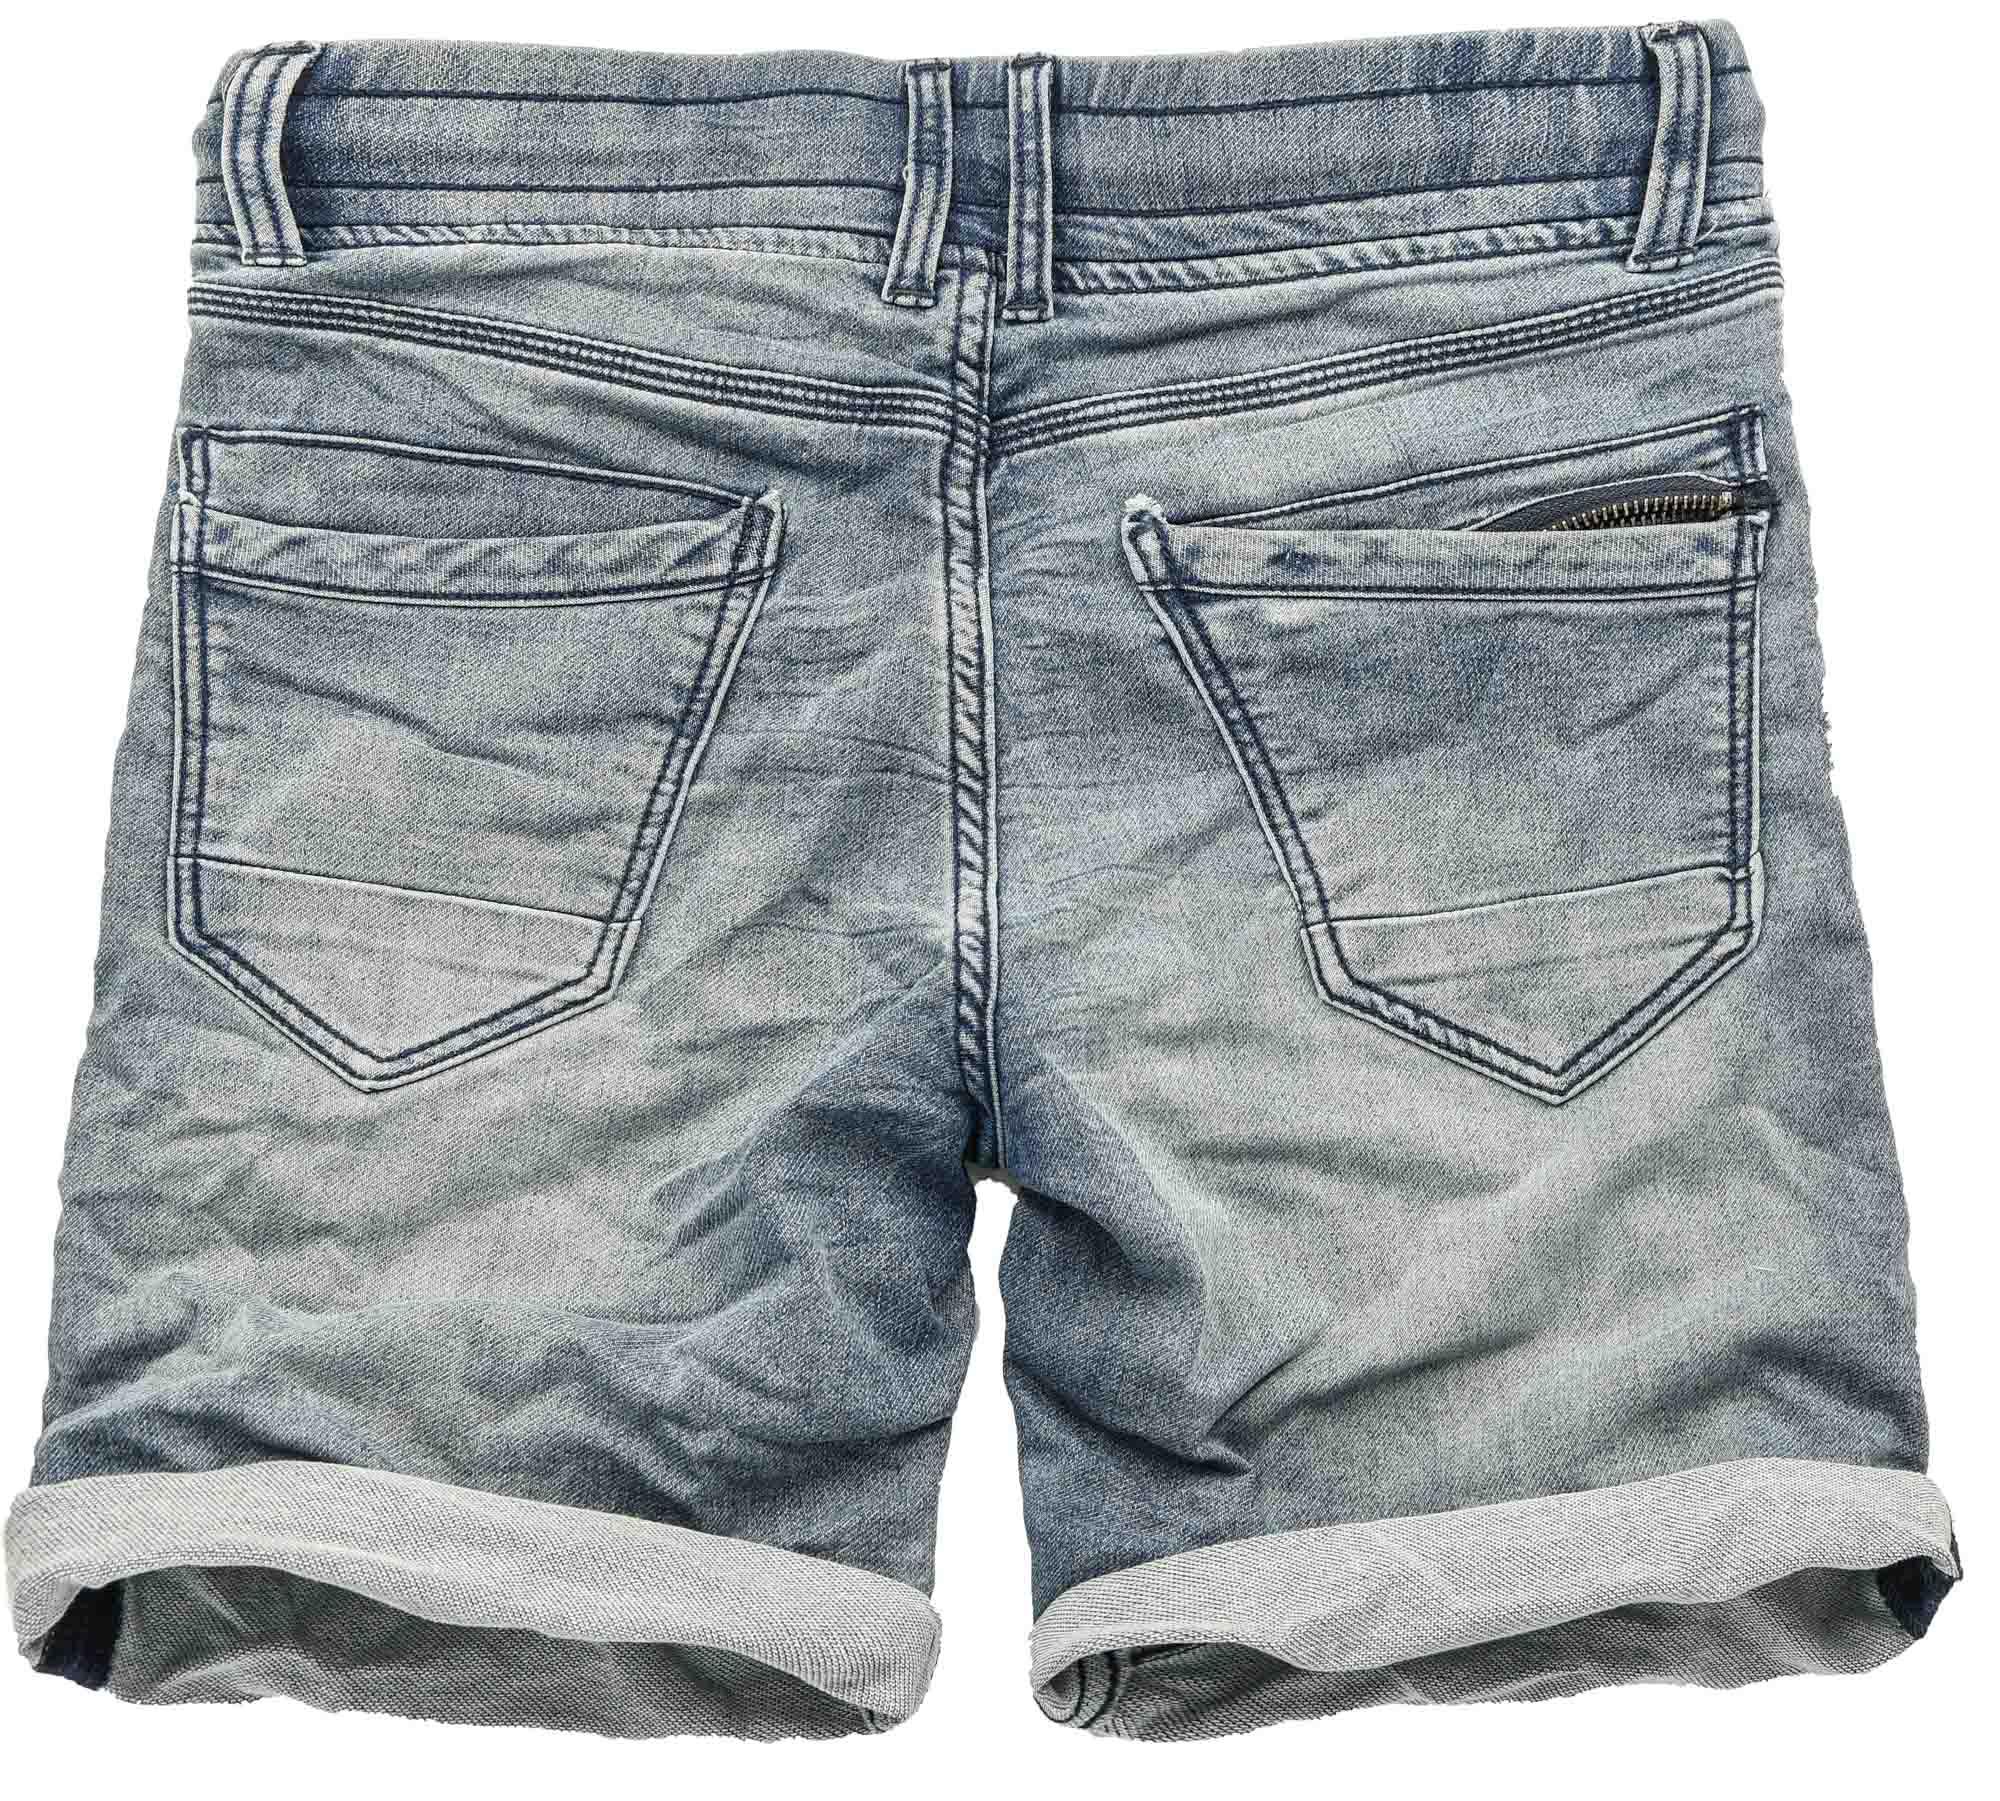 Sublevel-Herren-Sweat-Jeans-Shorts-kurze-Hose-Bermuda-Sommer-Sweathose-Slim-NEU Indexbild 12